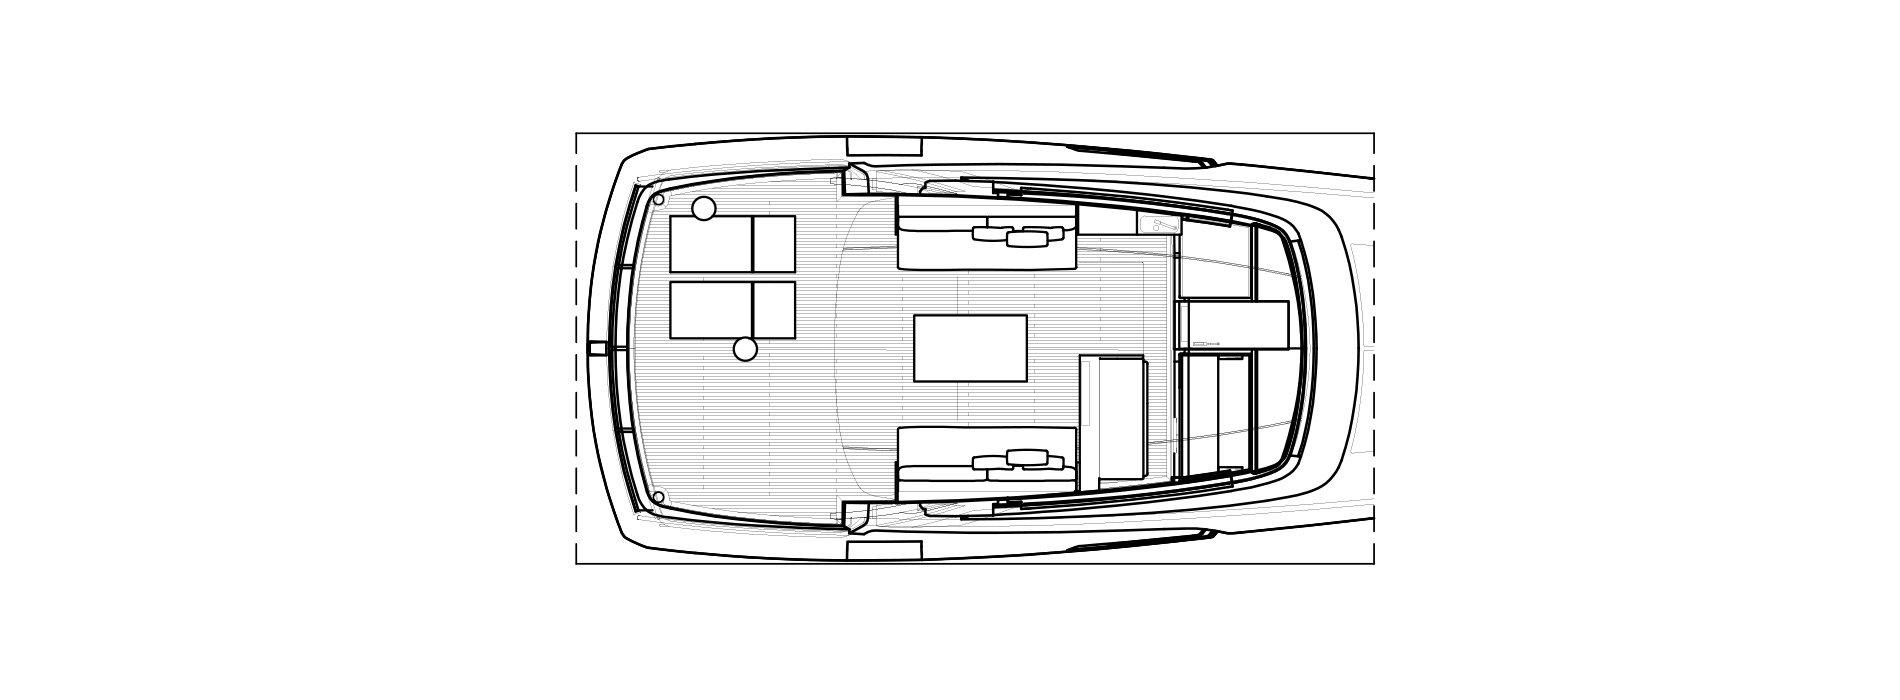 Sanlorenzo Yachts SX88 Details Versione Lissoni